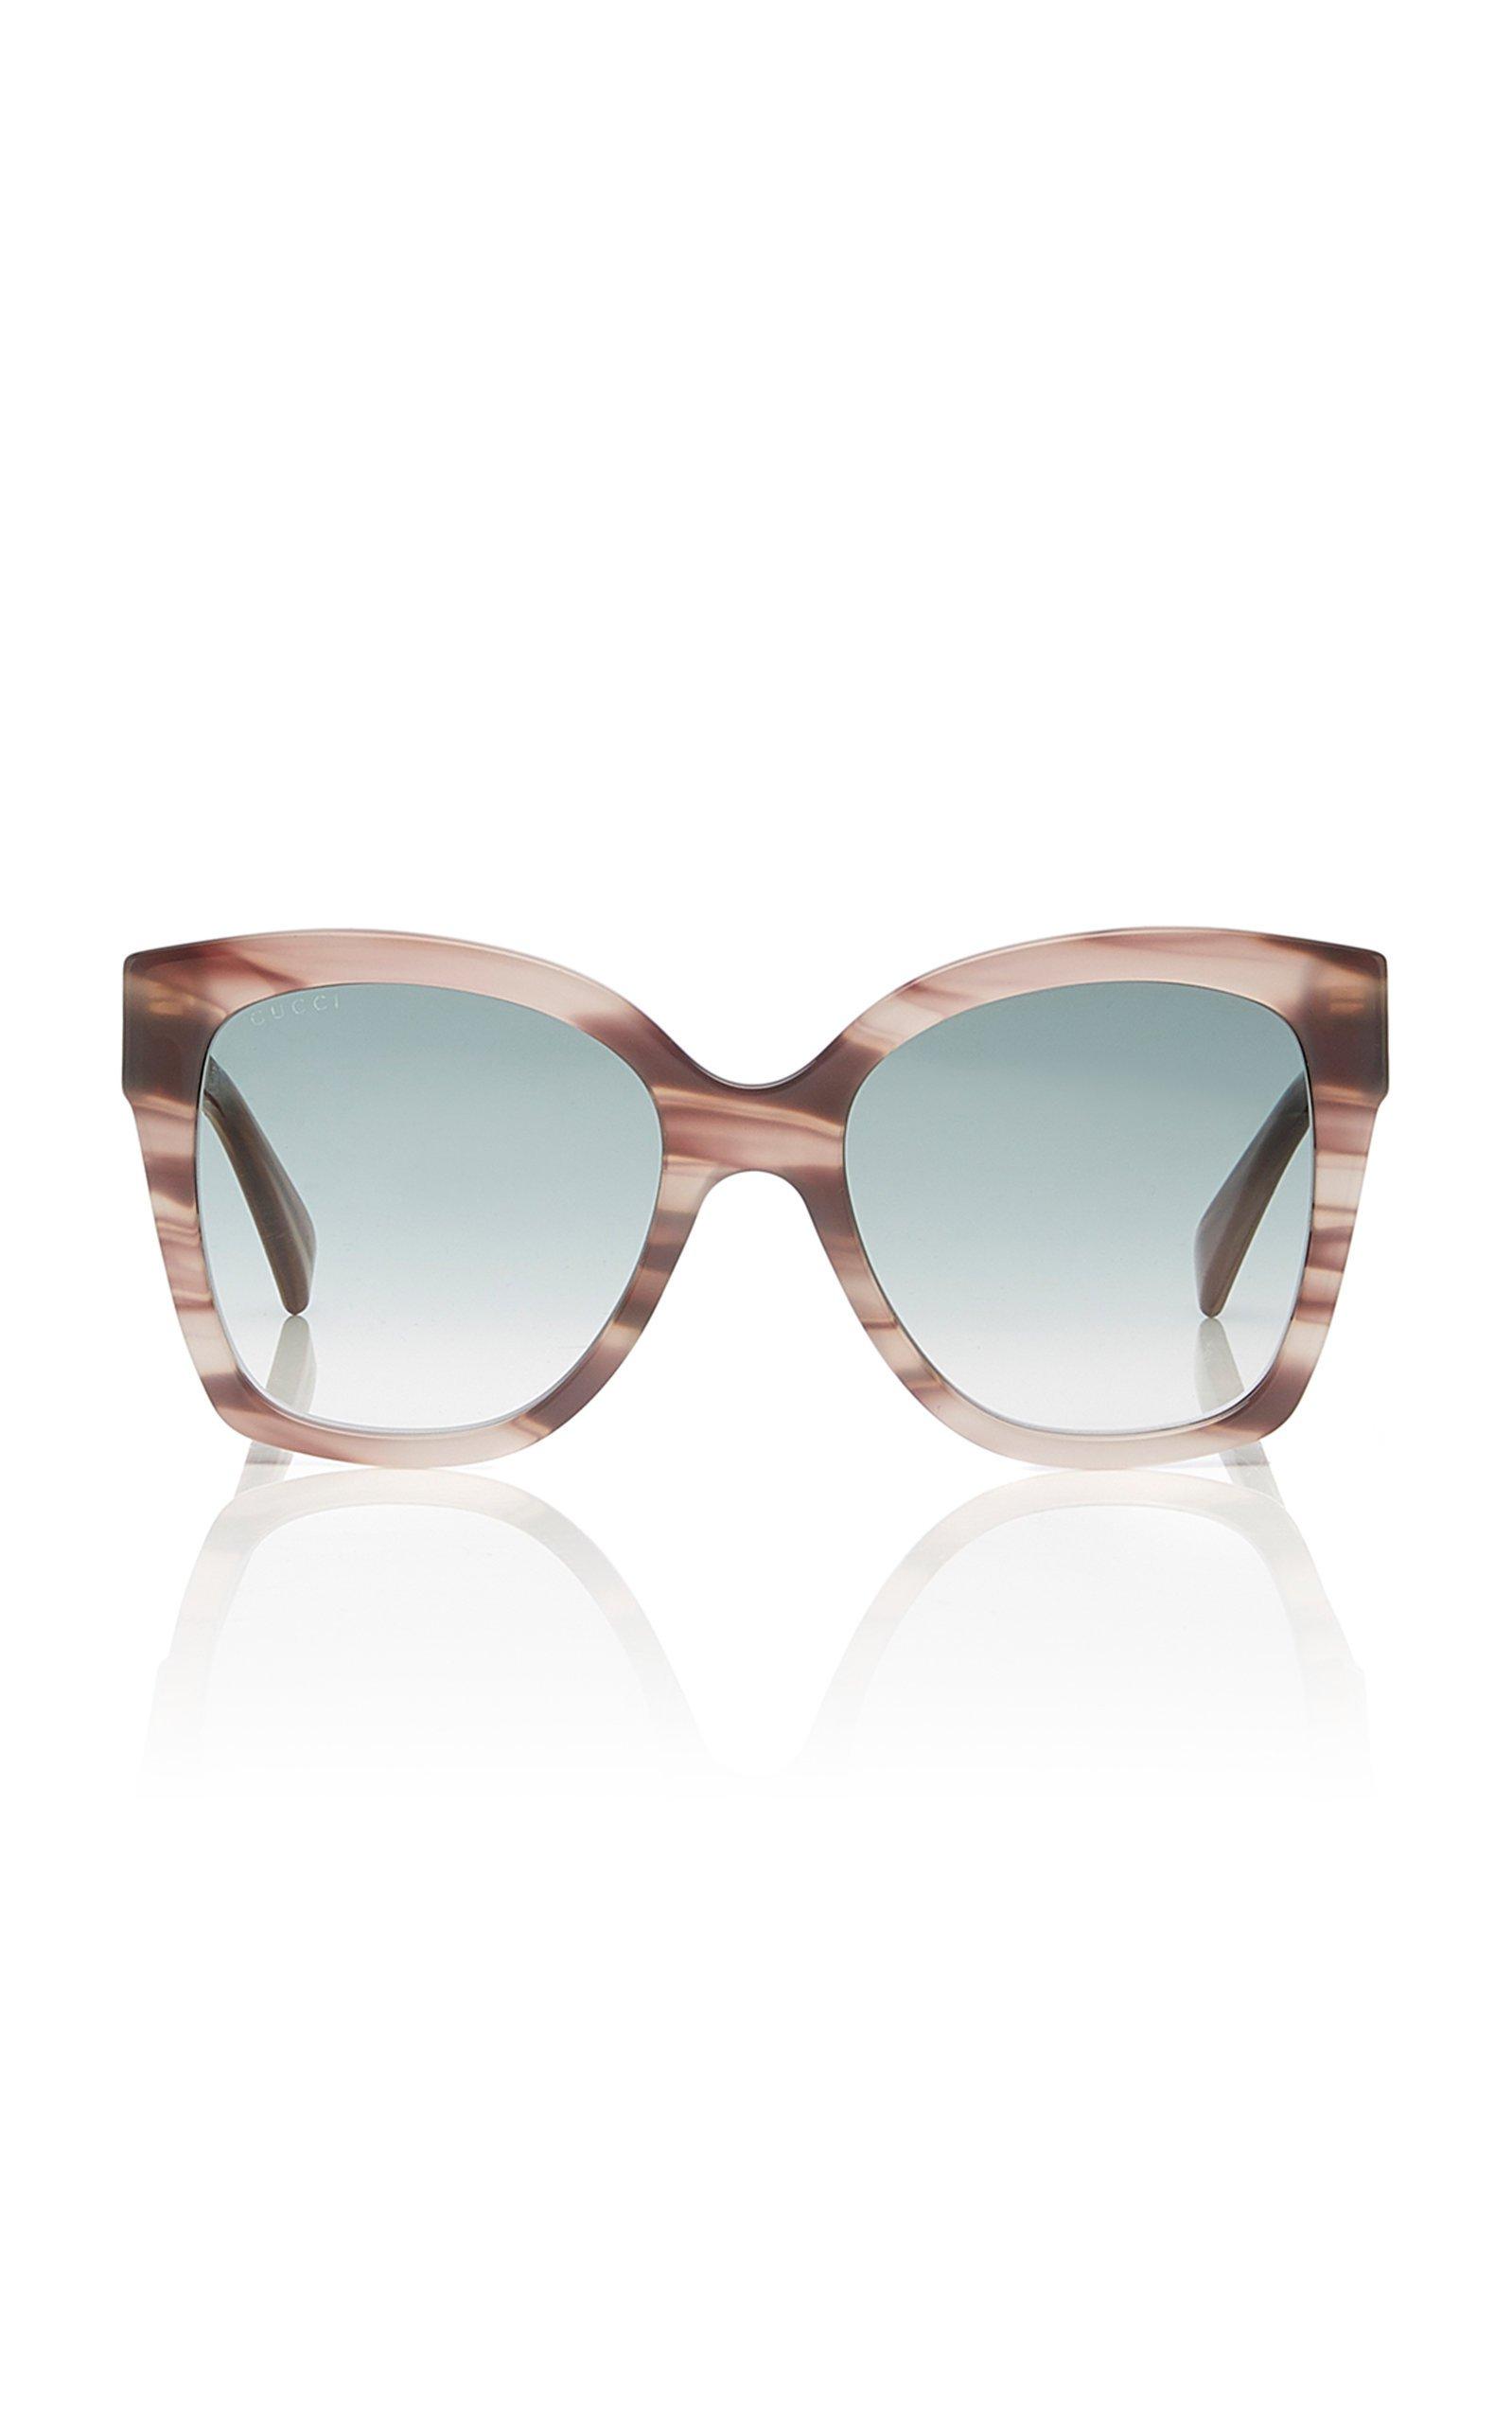 Gucci Sunglasses Marbled Acetate Square-Frame Sunglasses